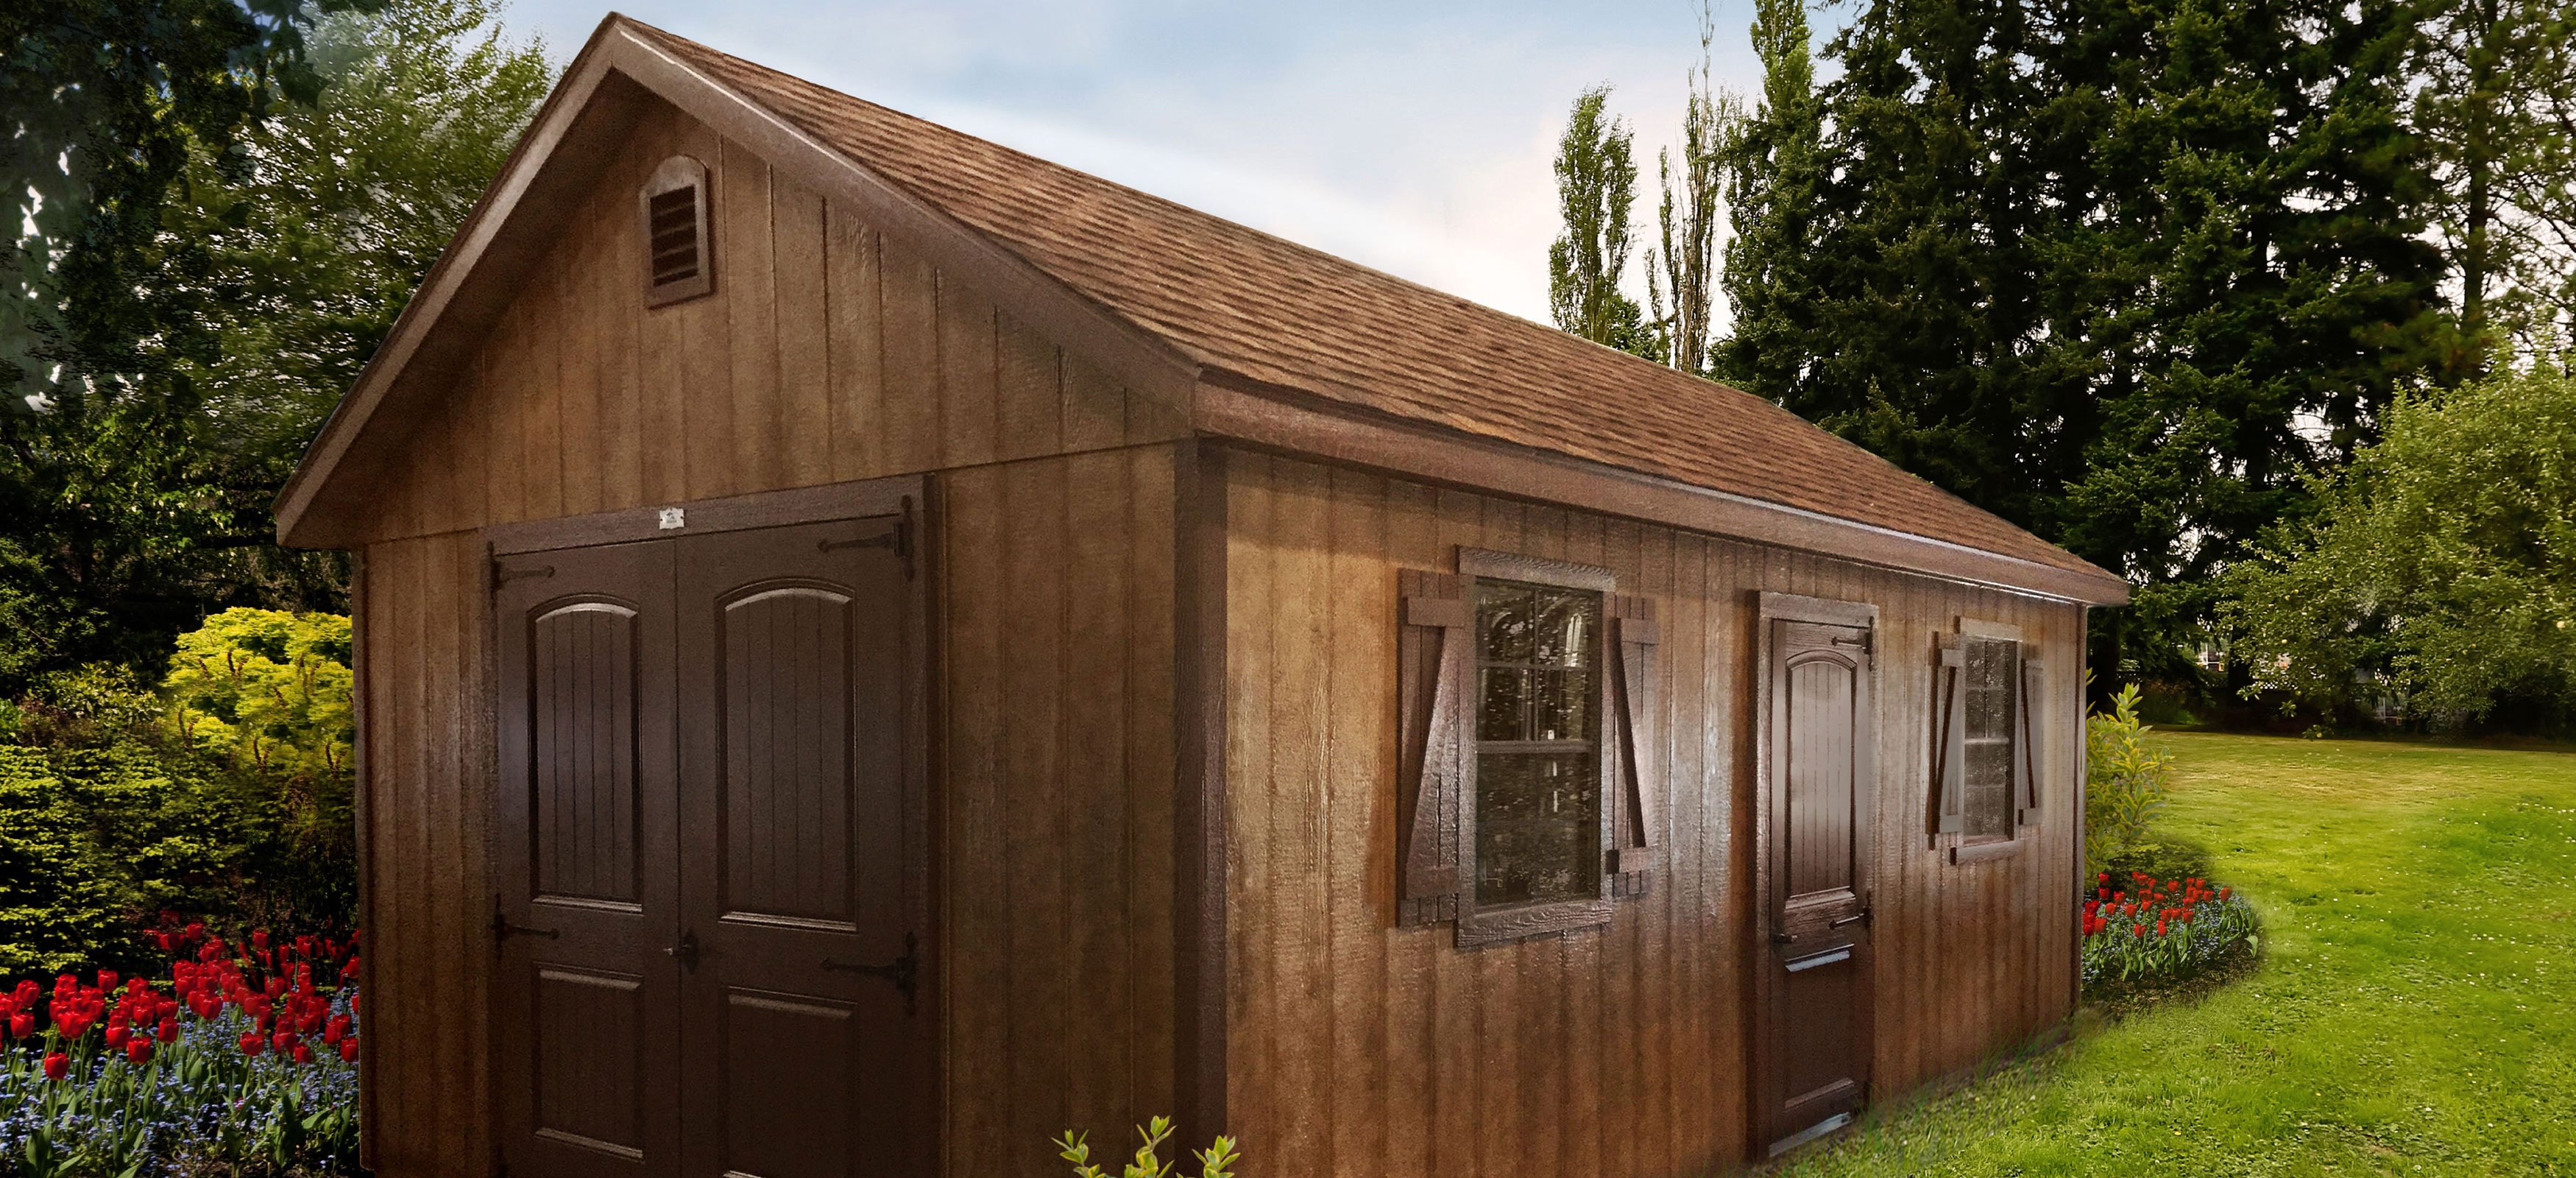 Garden Shed Xl Dakota Storage Buildings